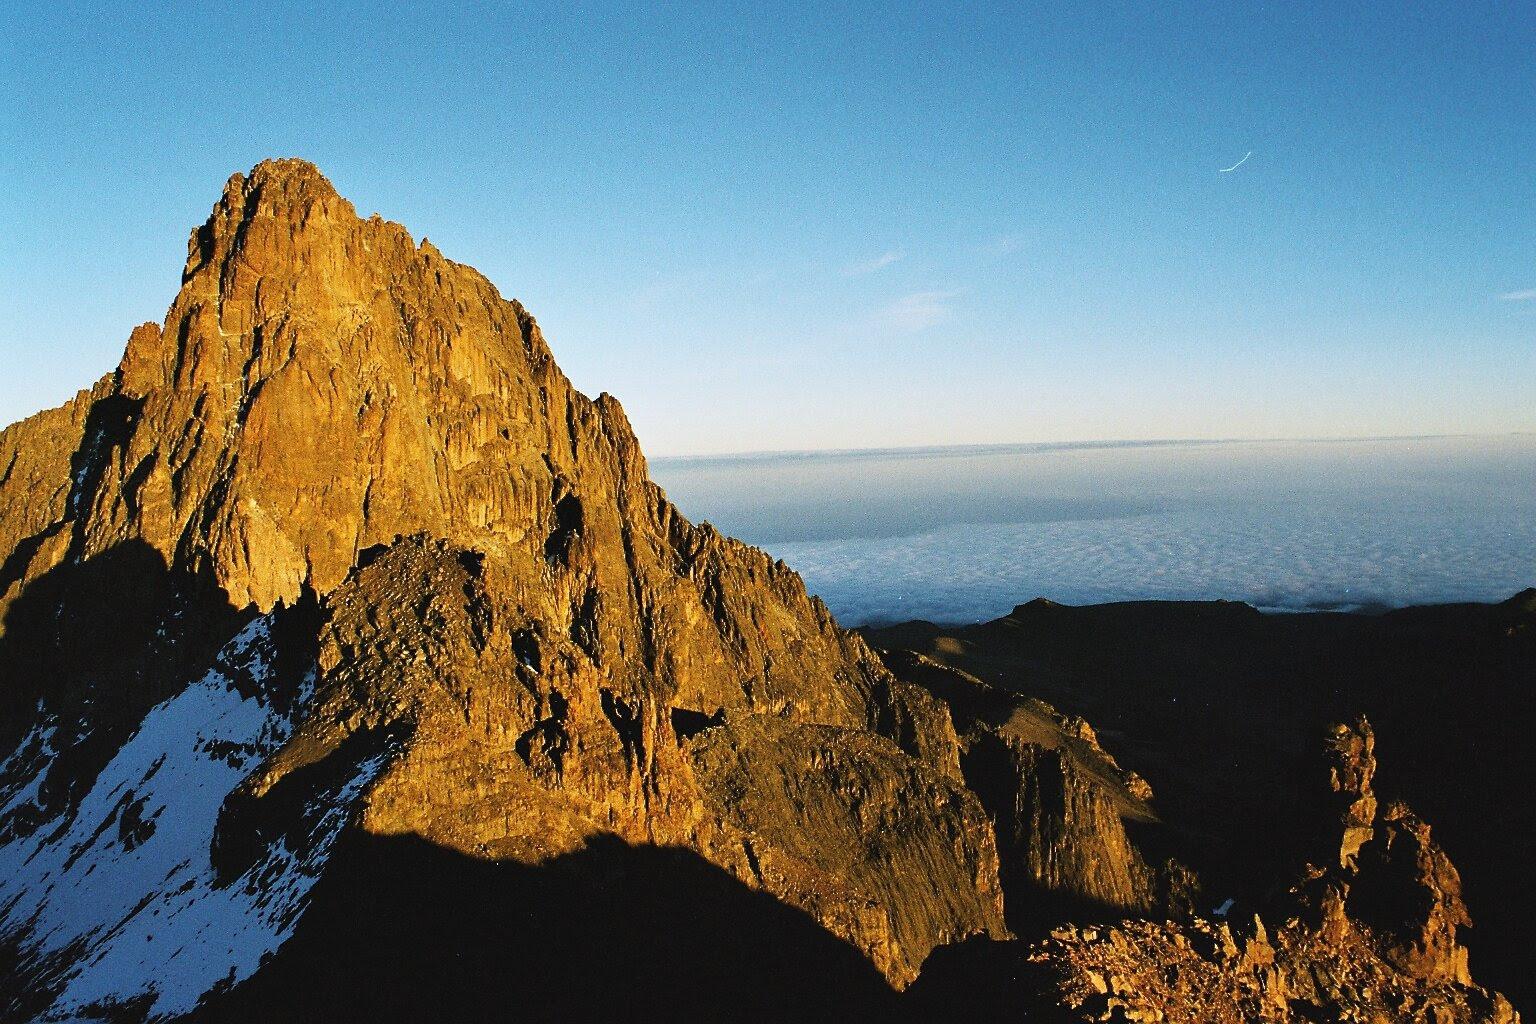 MT kenya Mount_Kenya wikipedia image of beautiful mount kenya with snow on one side shadows sunlight beautiful.jpg